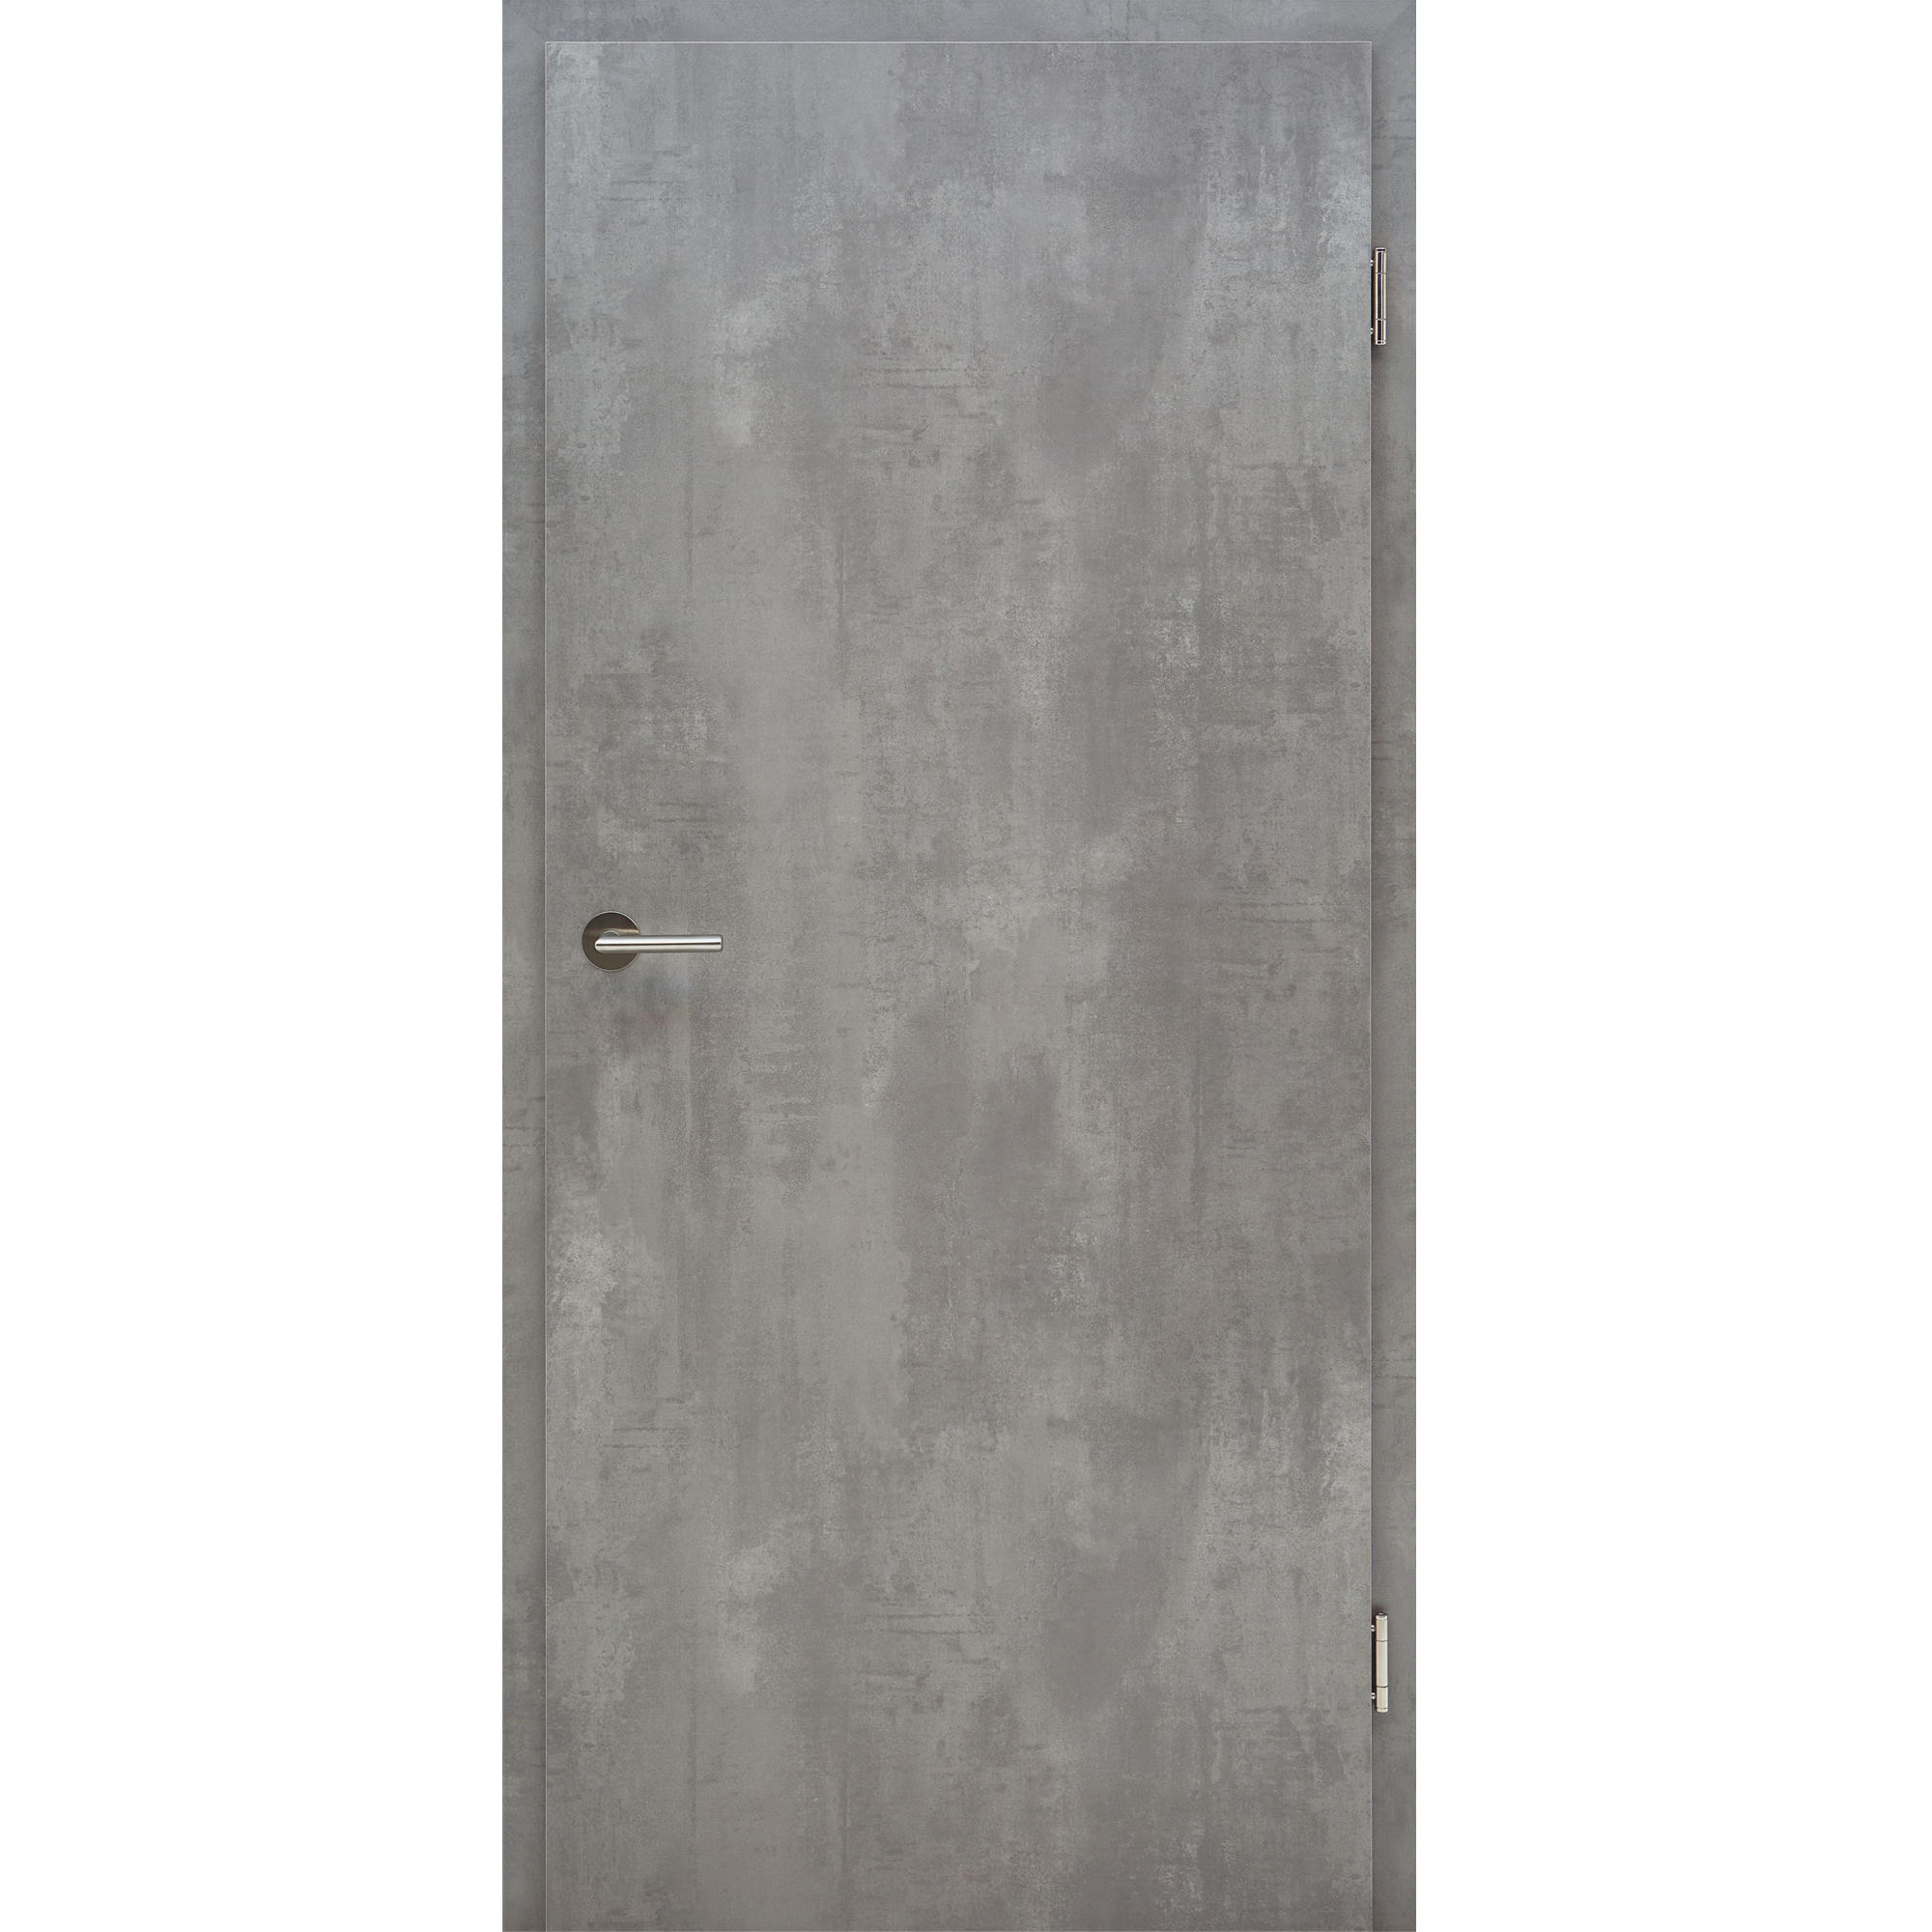 wohnungst r mit zarge cpl concrete vollspan kkl ii 27db. Black Bedroom Furniture Sets. Home Design Ideas